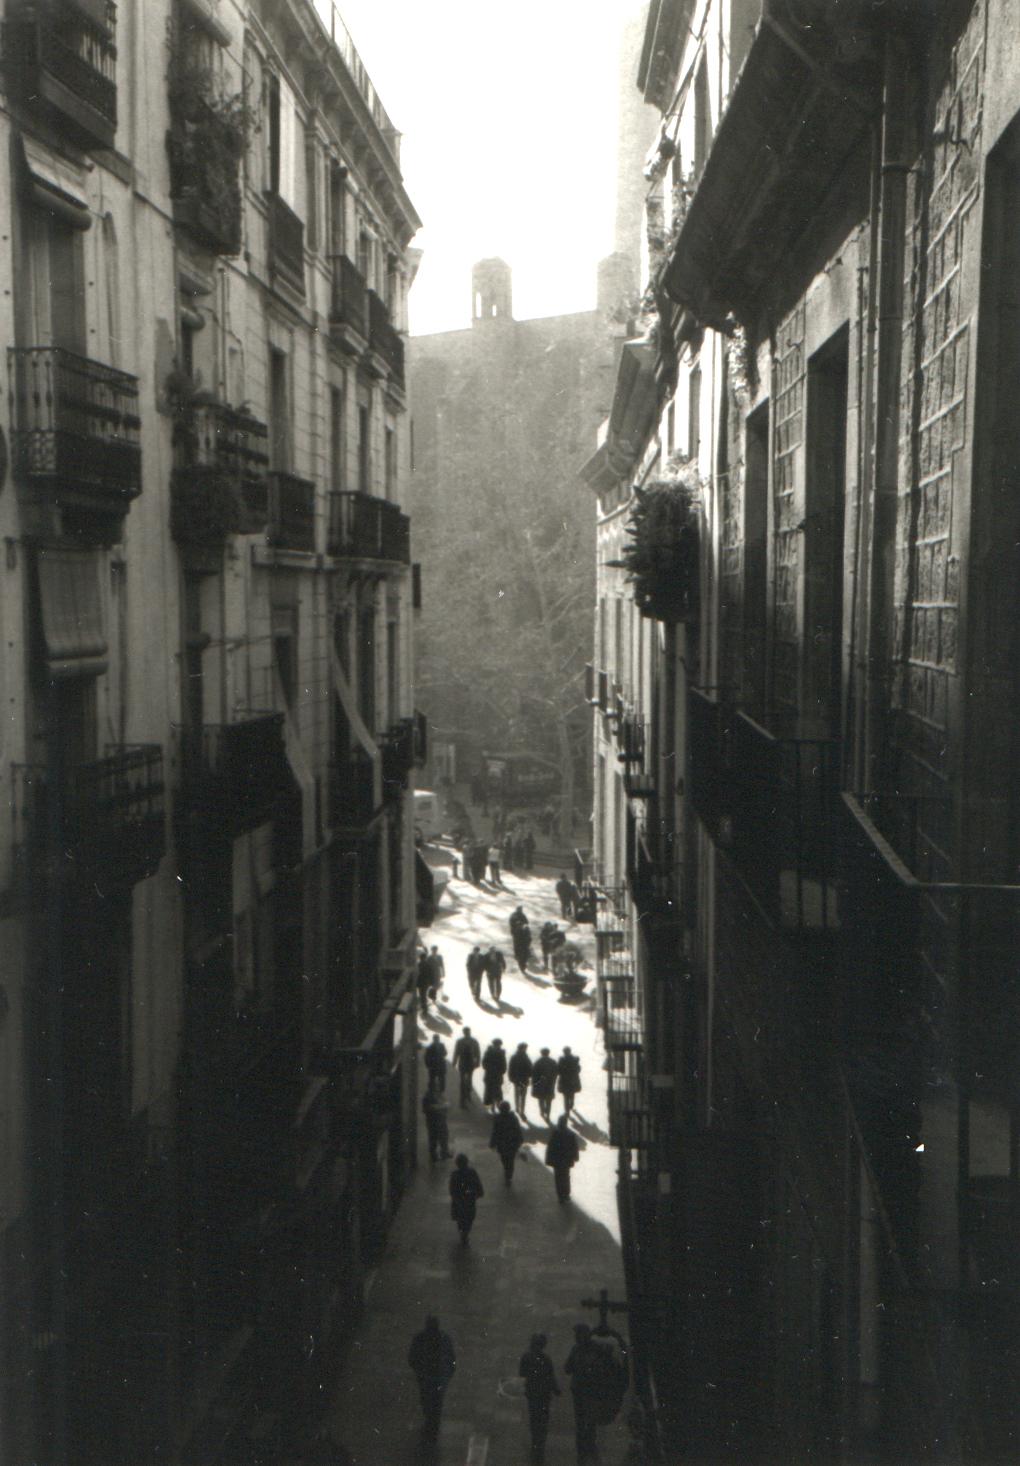 Barcelona Daylight Photo by Matt Fajkus 2.jpg